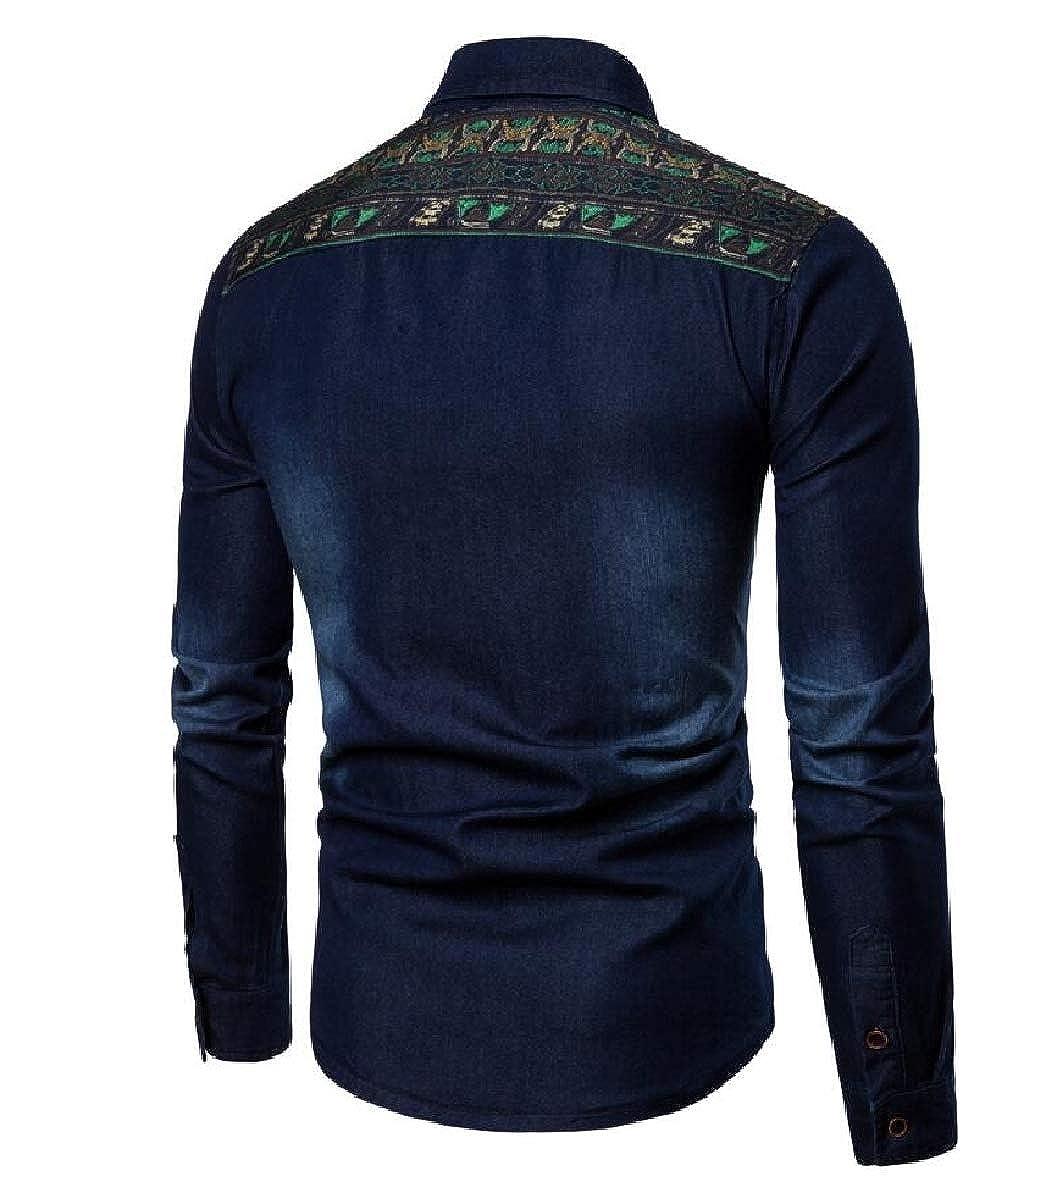 FLCH+YIGE Mens Slim Fit Printed Shirt Long Sleeve Button Down Autumn Denim Shirts